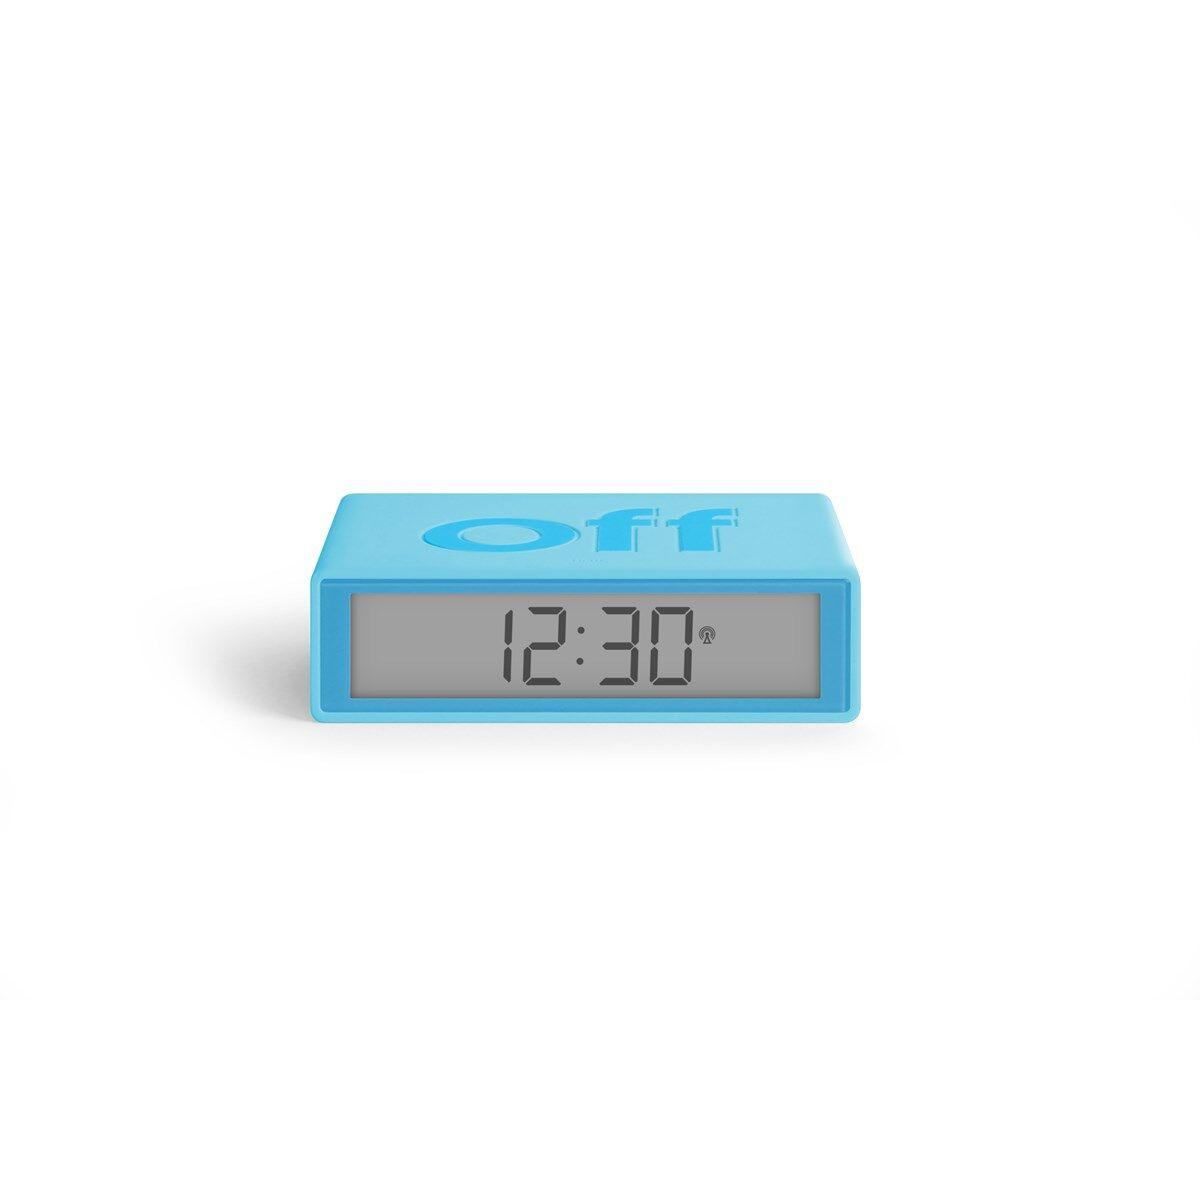 Lexon Réveil LCD réversible ON-OFF en ABS Bleu turquoise